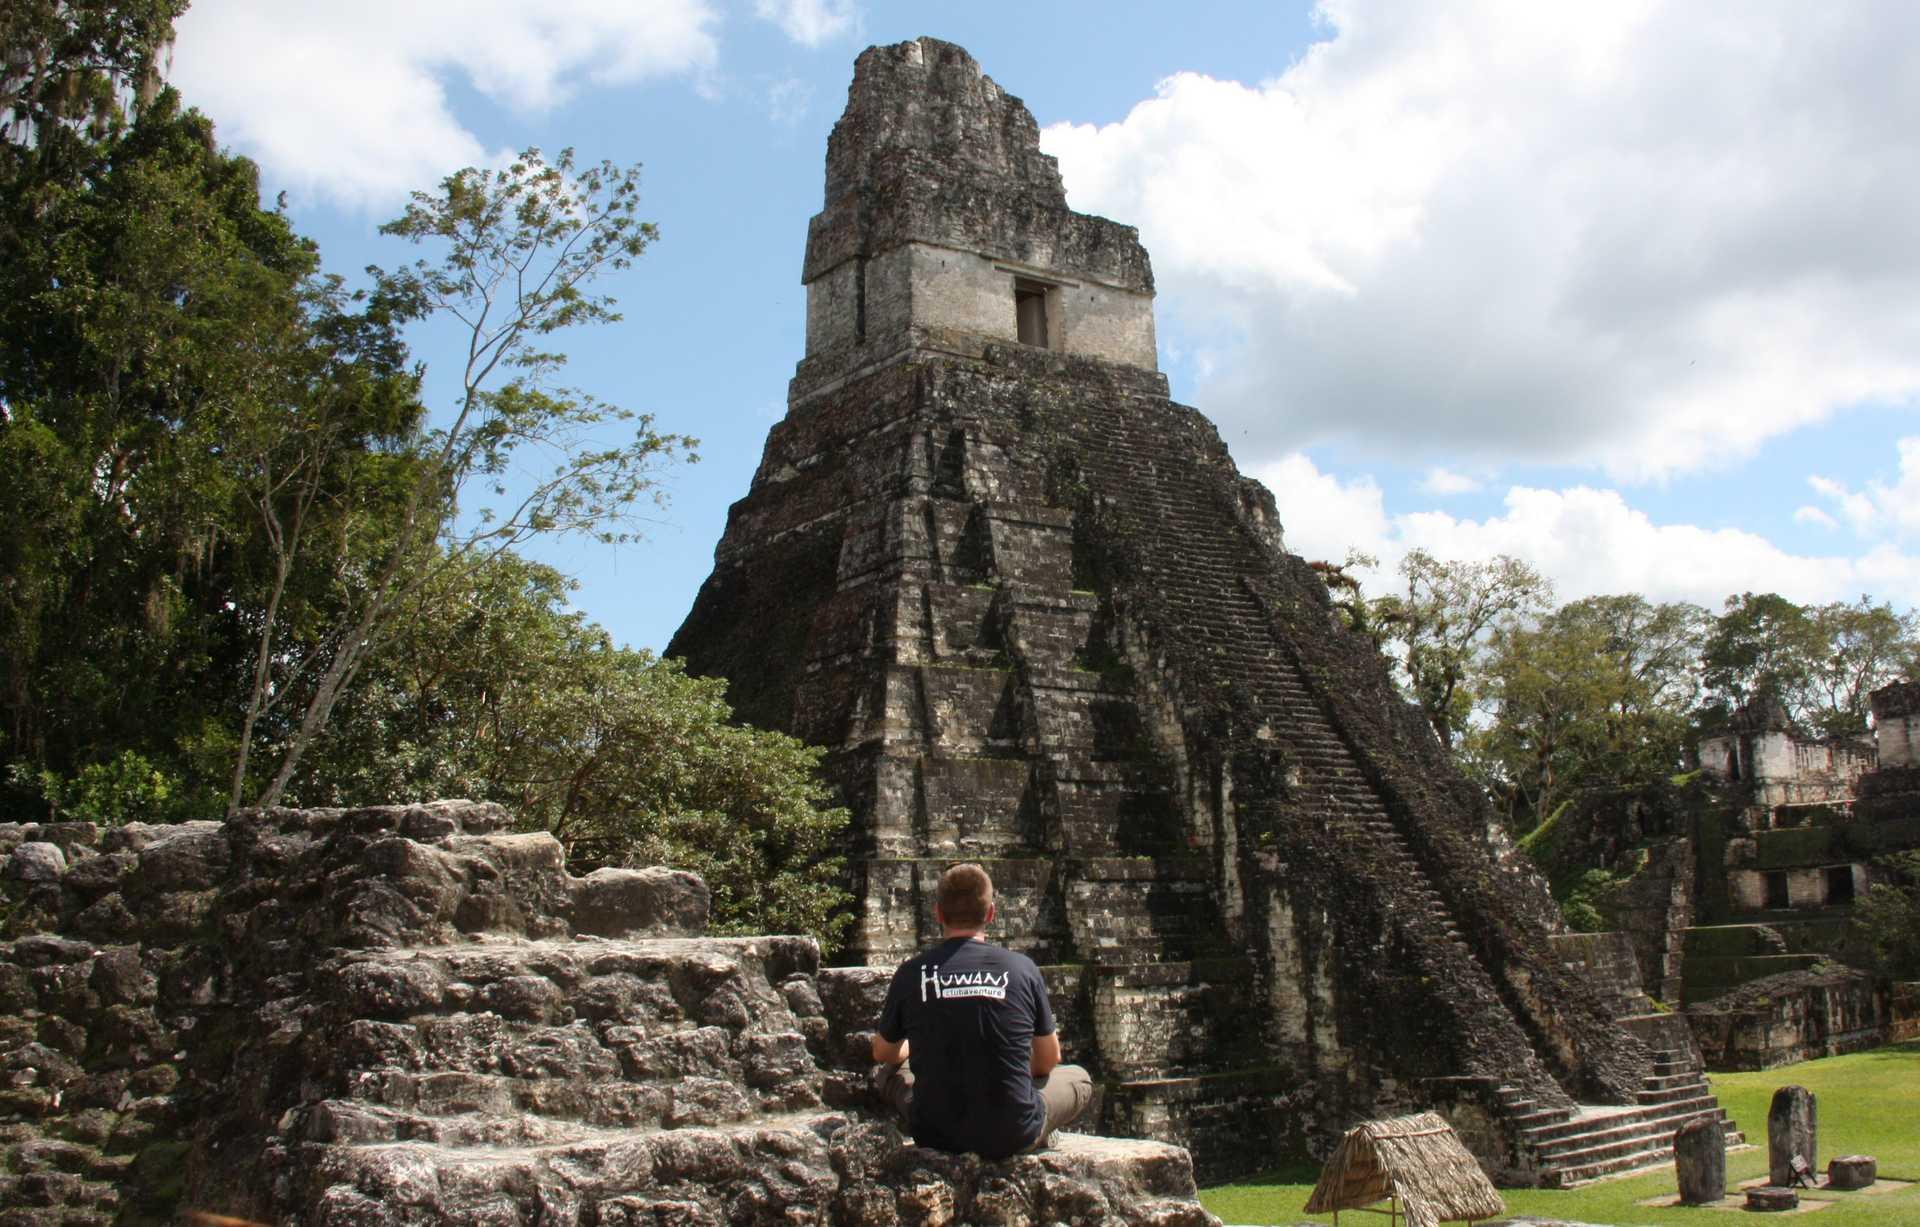 voyage découverte Guatemala Honduras, Tikal, lac Atitlan, Antigua